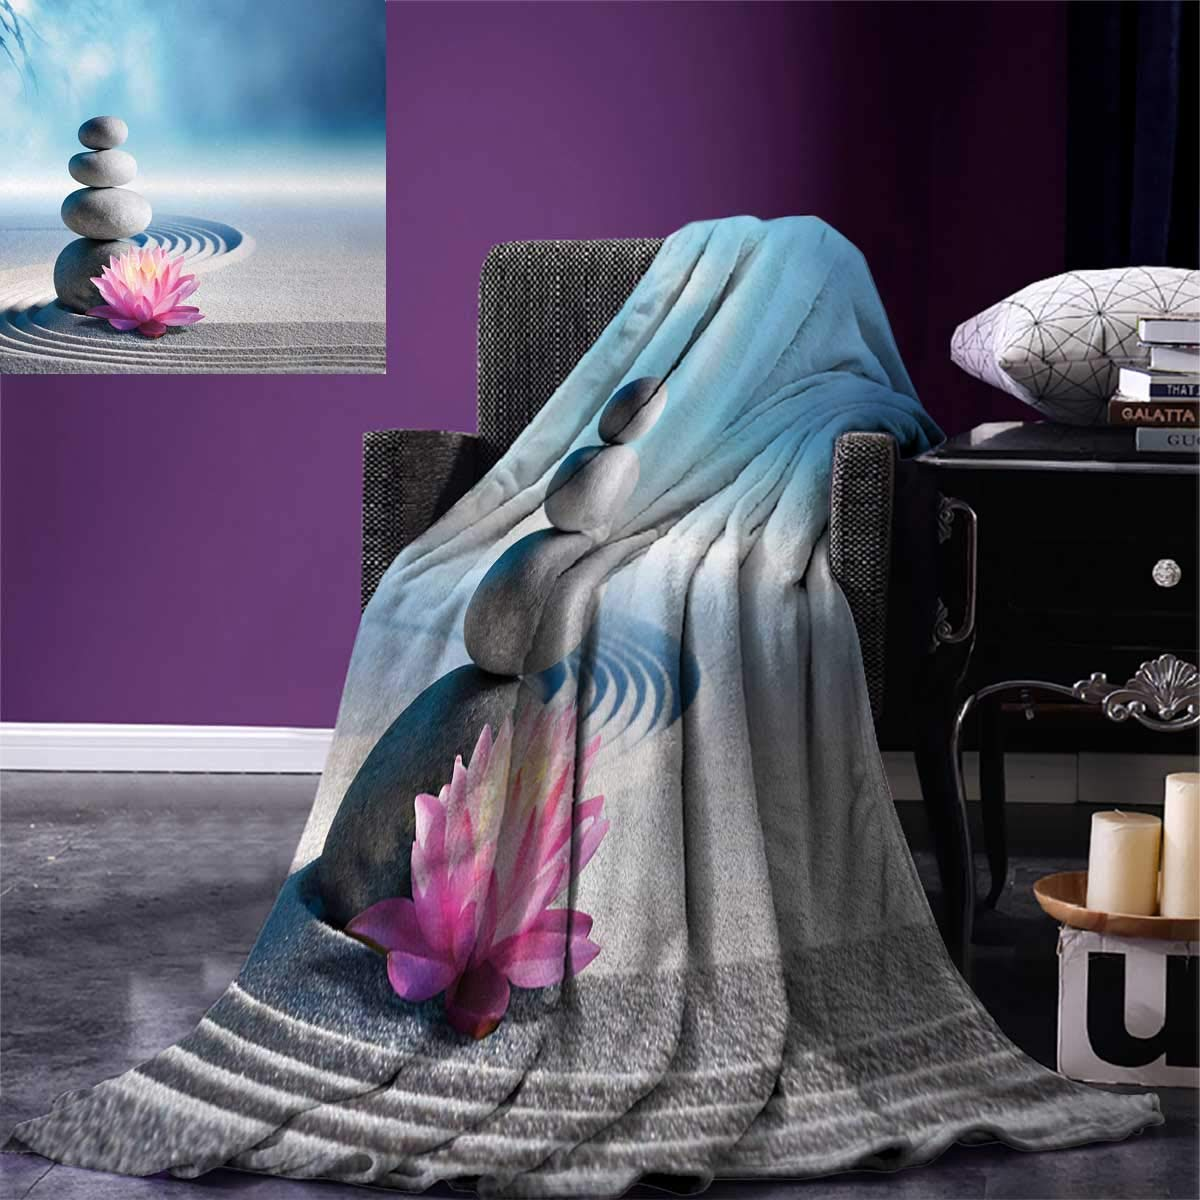 Spa Digital Printing Blanket Stones and Lotus Flower Over Sand Meditation Harmony Balance Flourish Your Spirit Summer Quilt Comforter 80''x60'' Grey Blue Pink